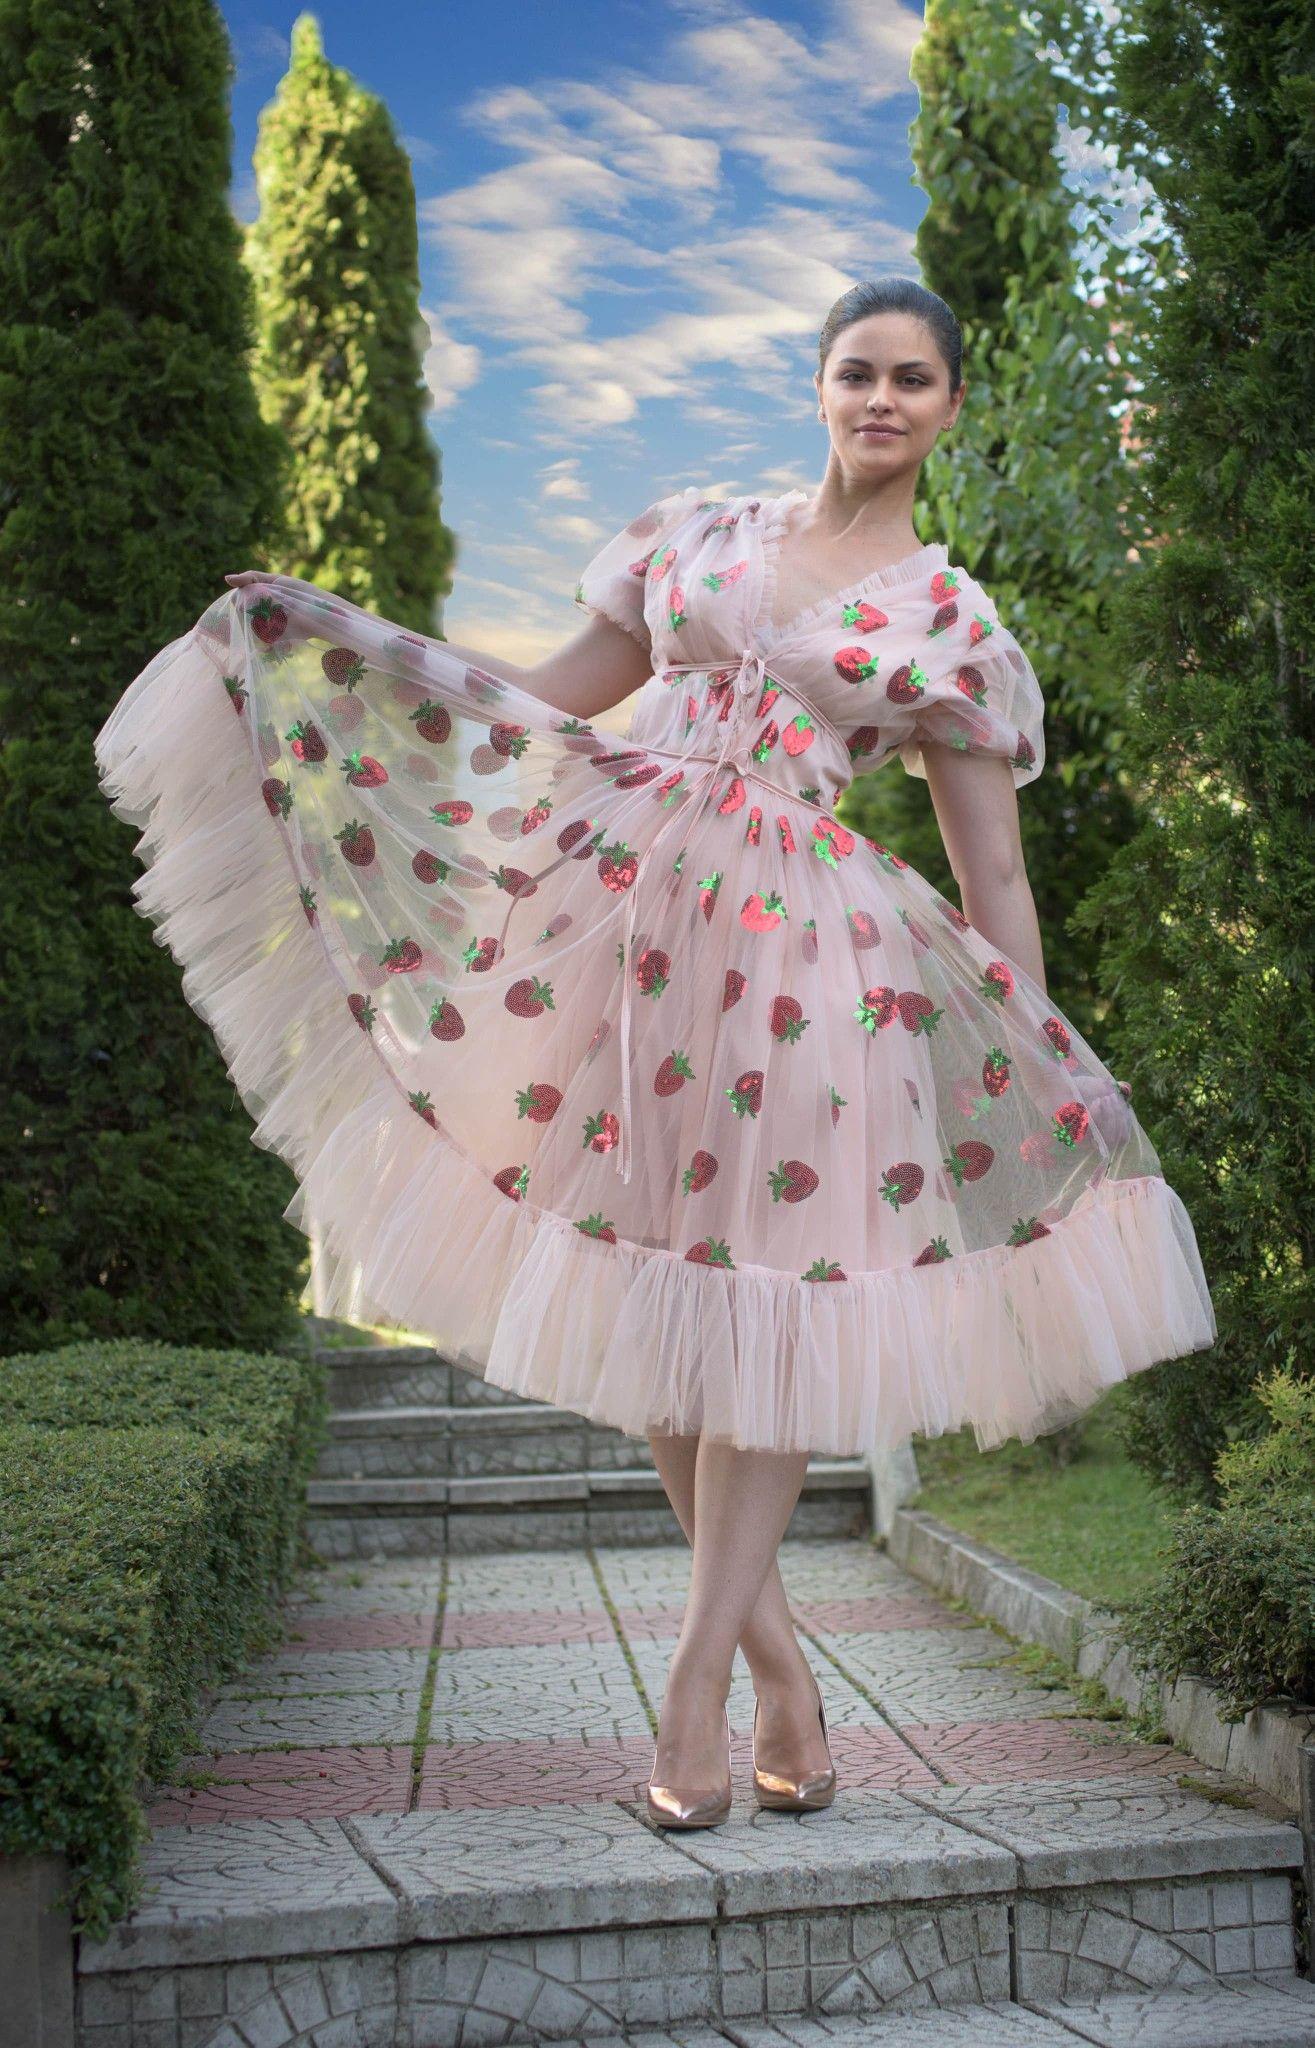 Sequins Strawberry Tulle Dress Svetlanadesignroom Strawberry Dress Pretty Dresses Summer Fashion Dresses [ 2048 x 1315 Pixel ]